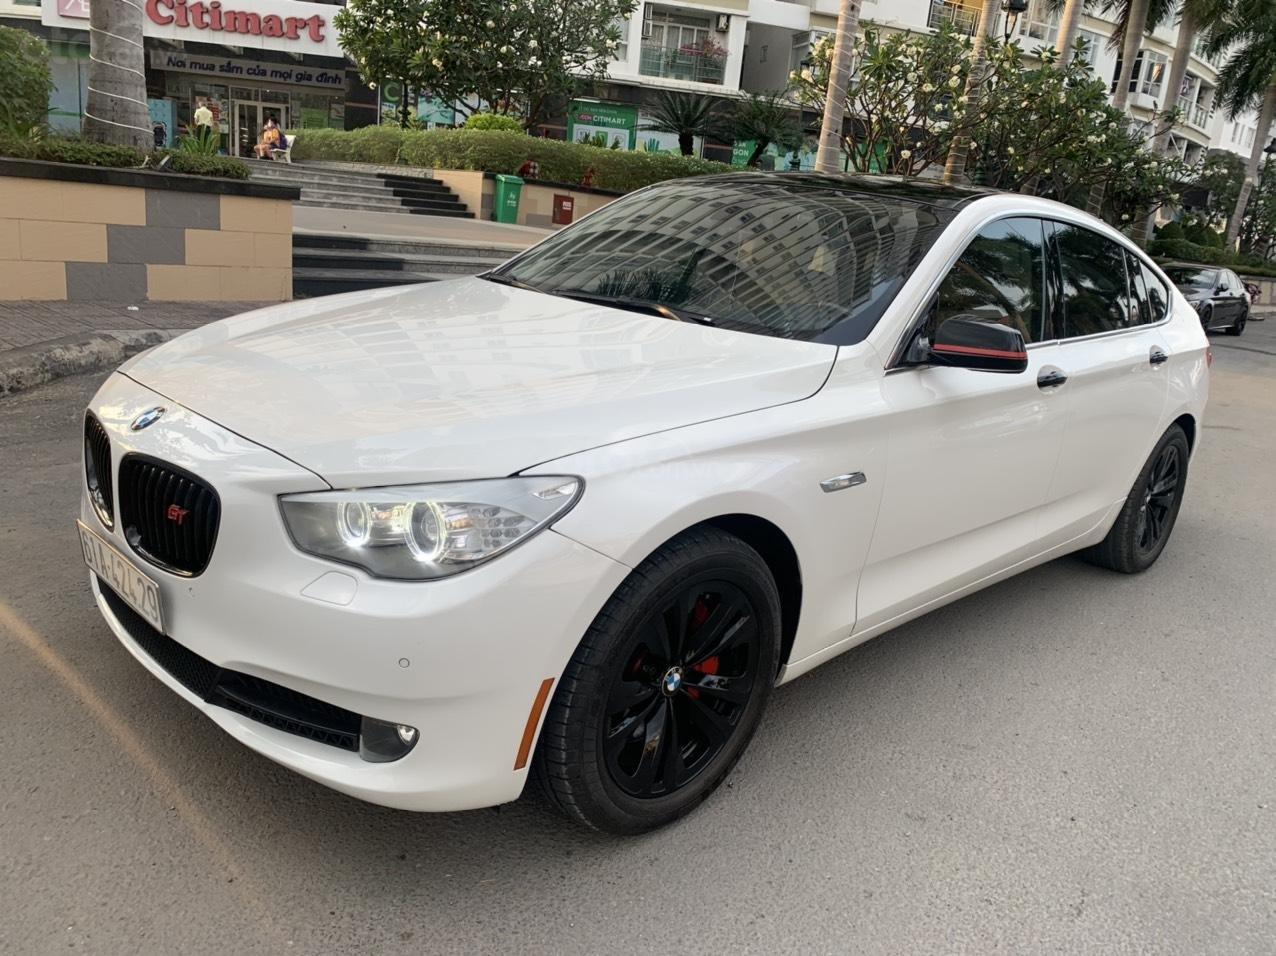 Cần bán gấp BMW 535GT SX 2011, giá 960 triệu (9)